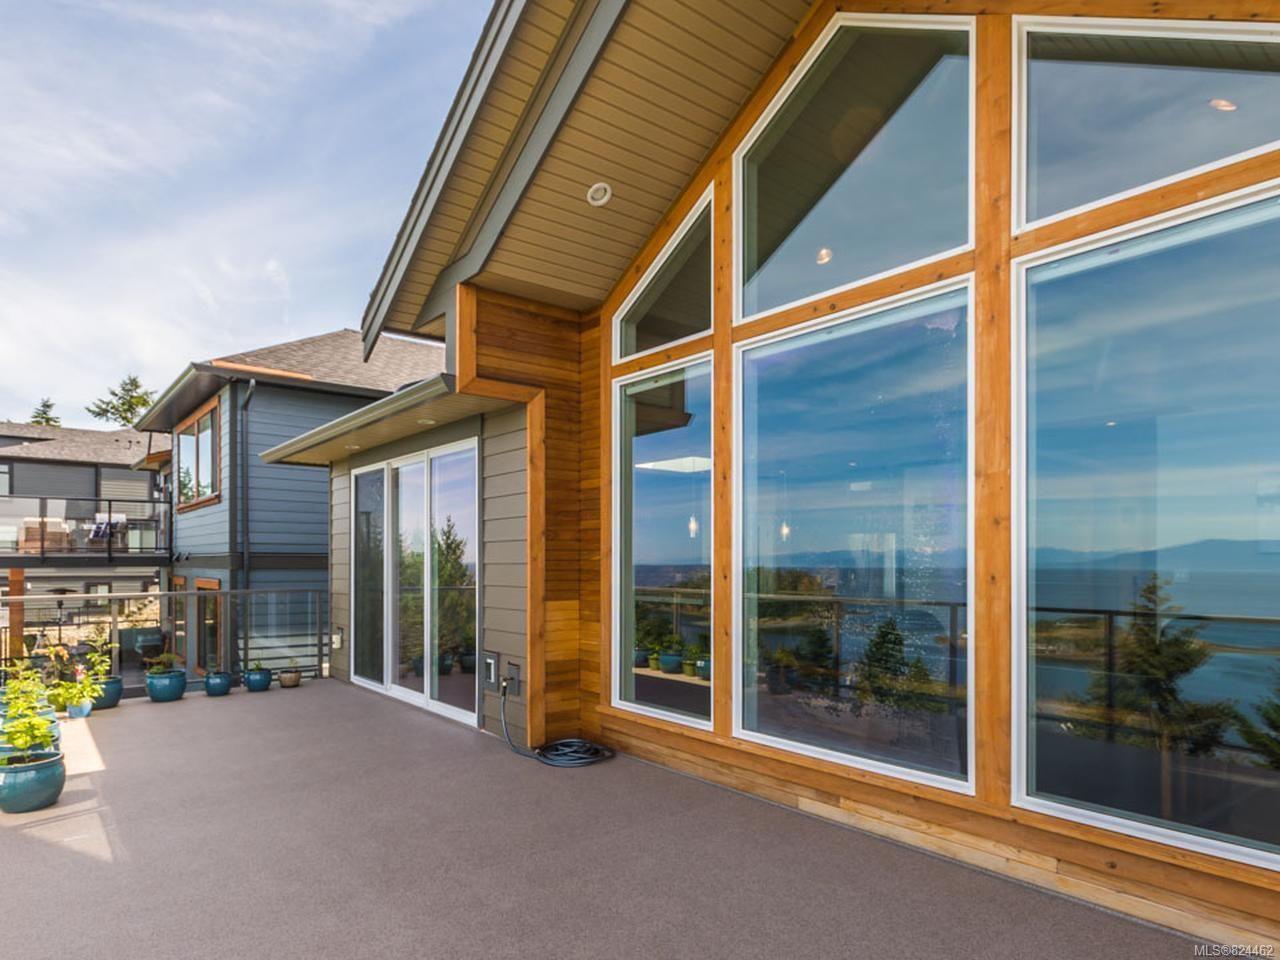 Photo 36: Photos: 3864 Gulfview Dr in NANAIMO: Na North Nanaimo House for sale (Nanaimo)  : MLS®# 824462